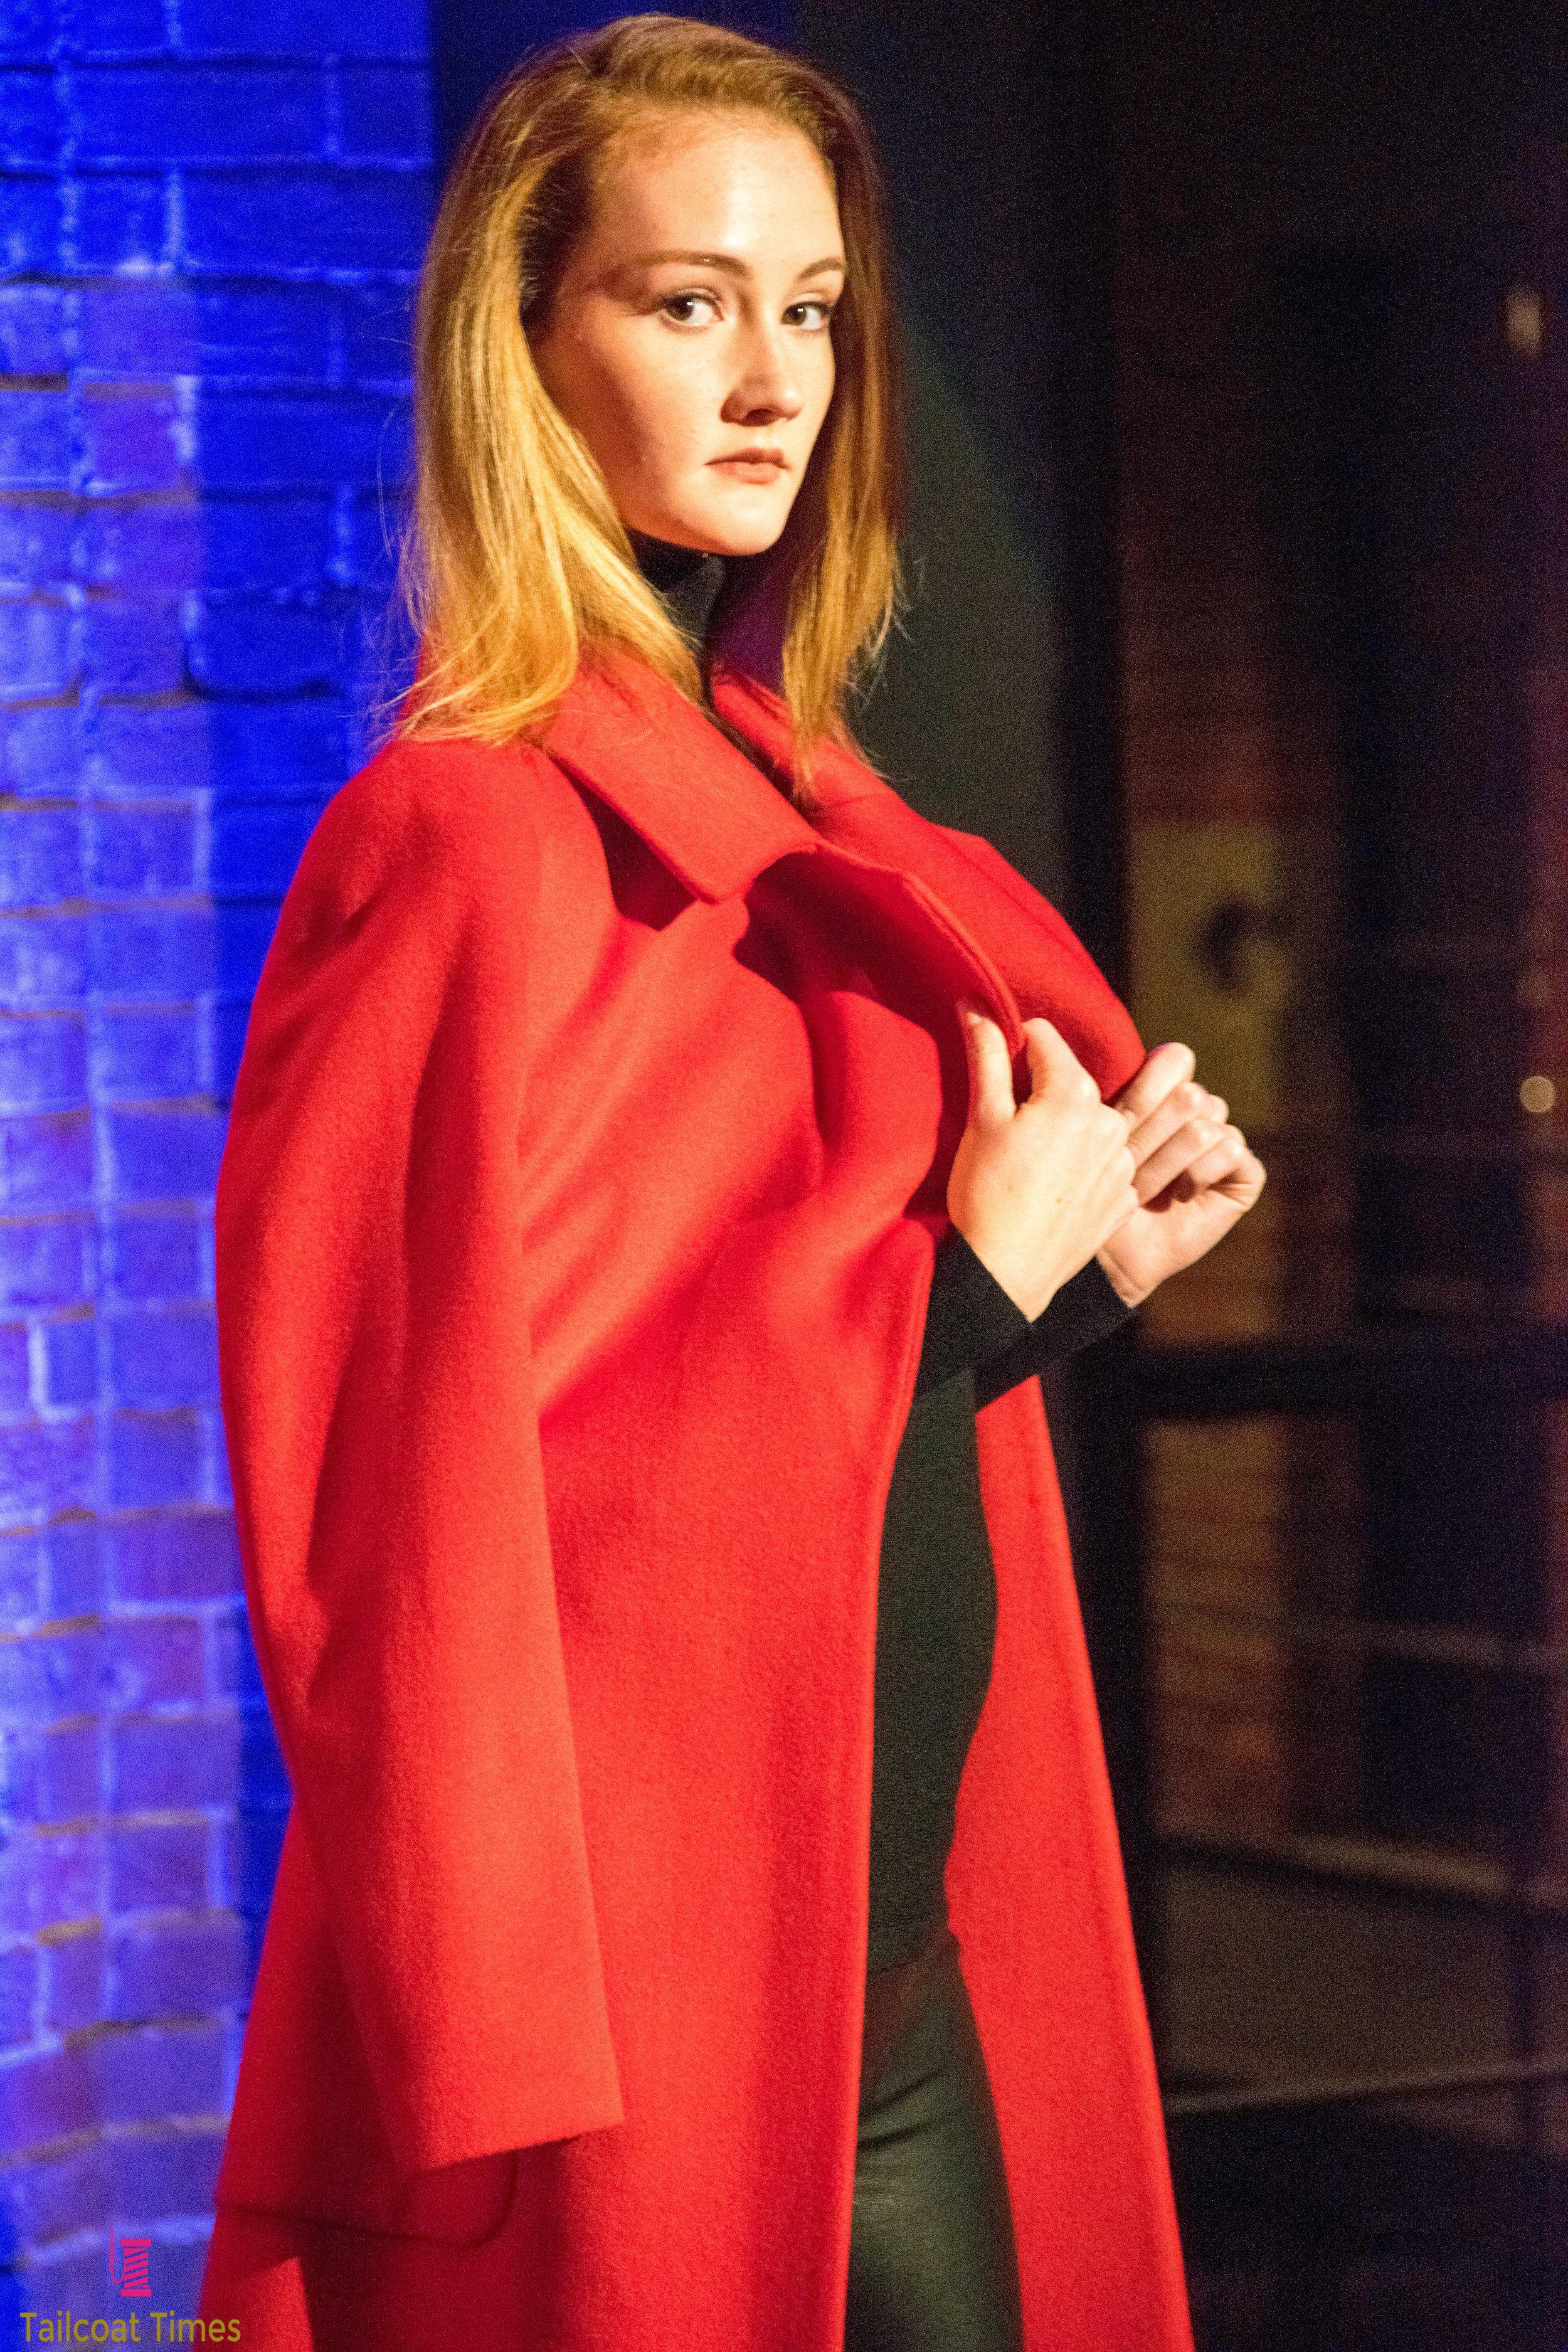 FashionablyLate-REISS-Tailcoat Times-10.jpg